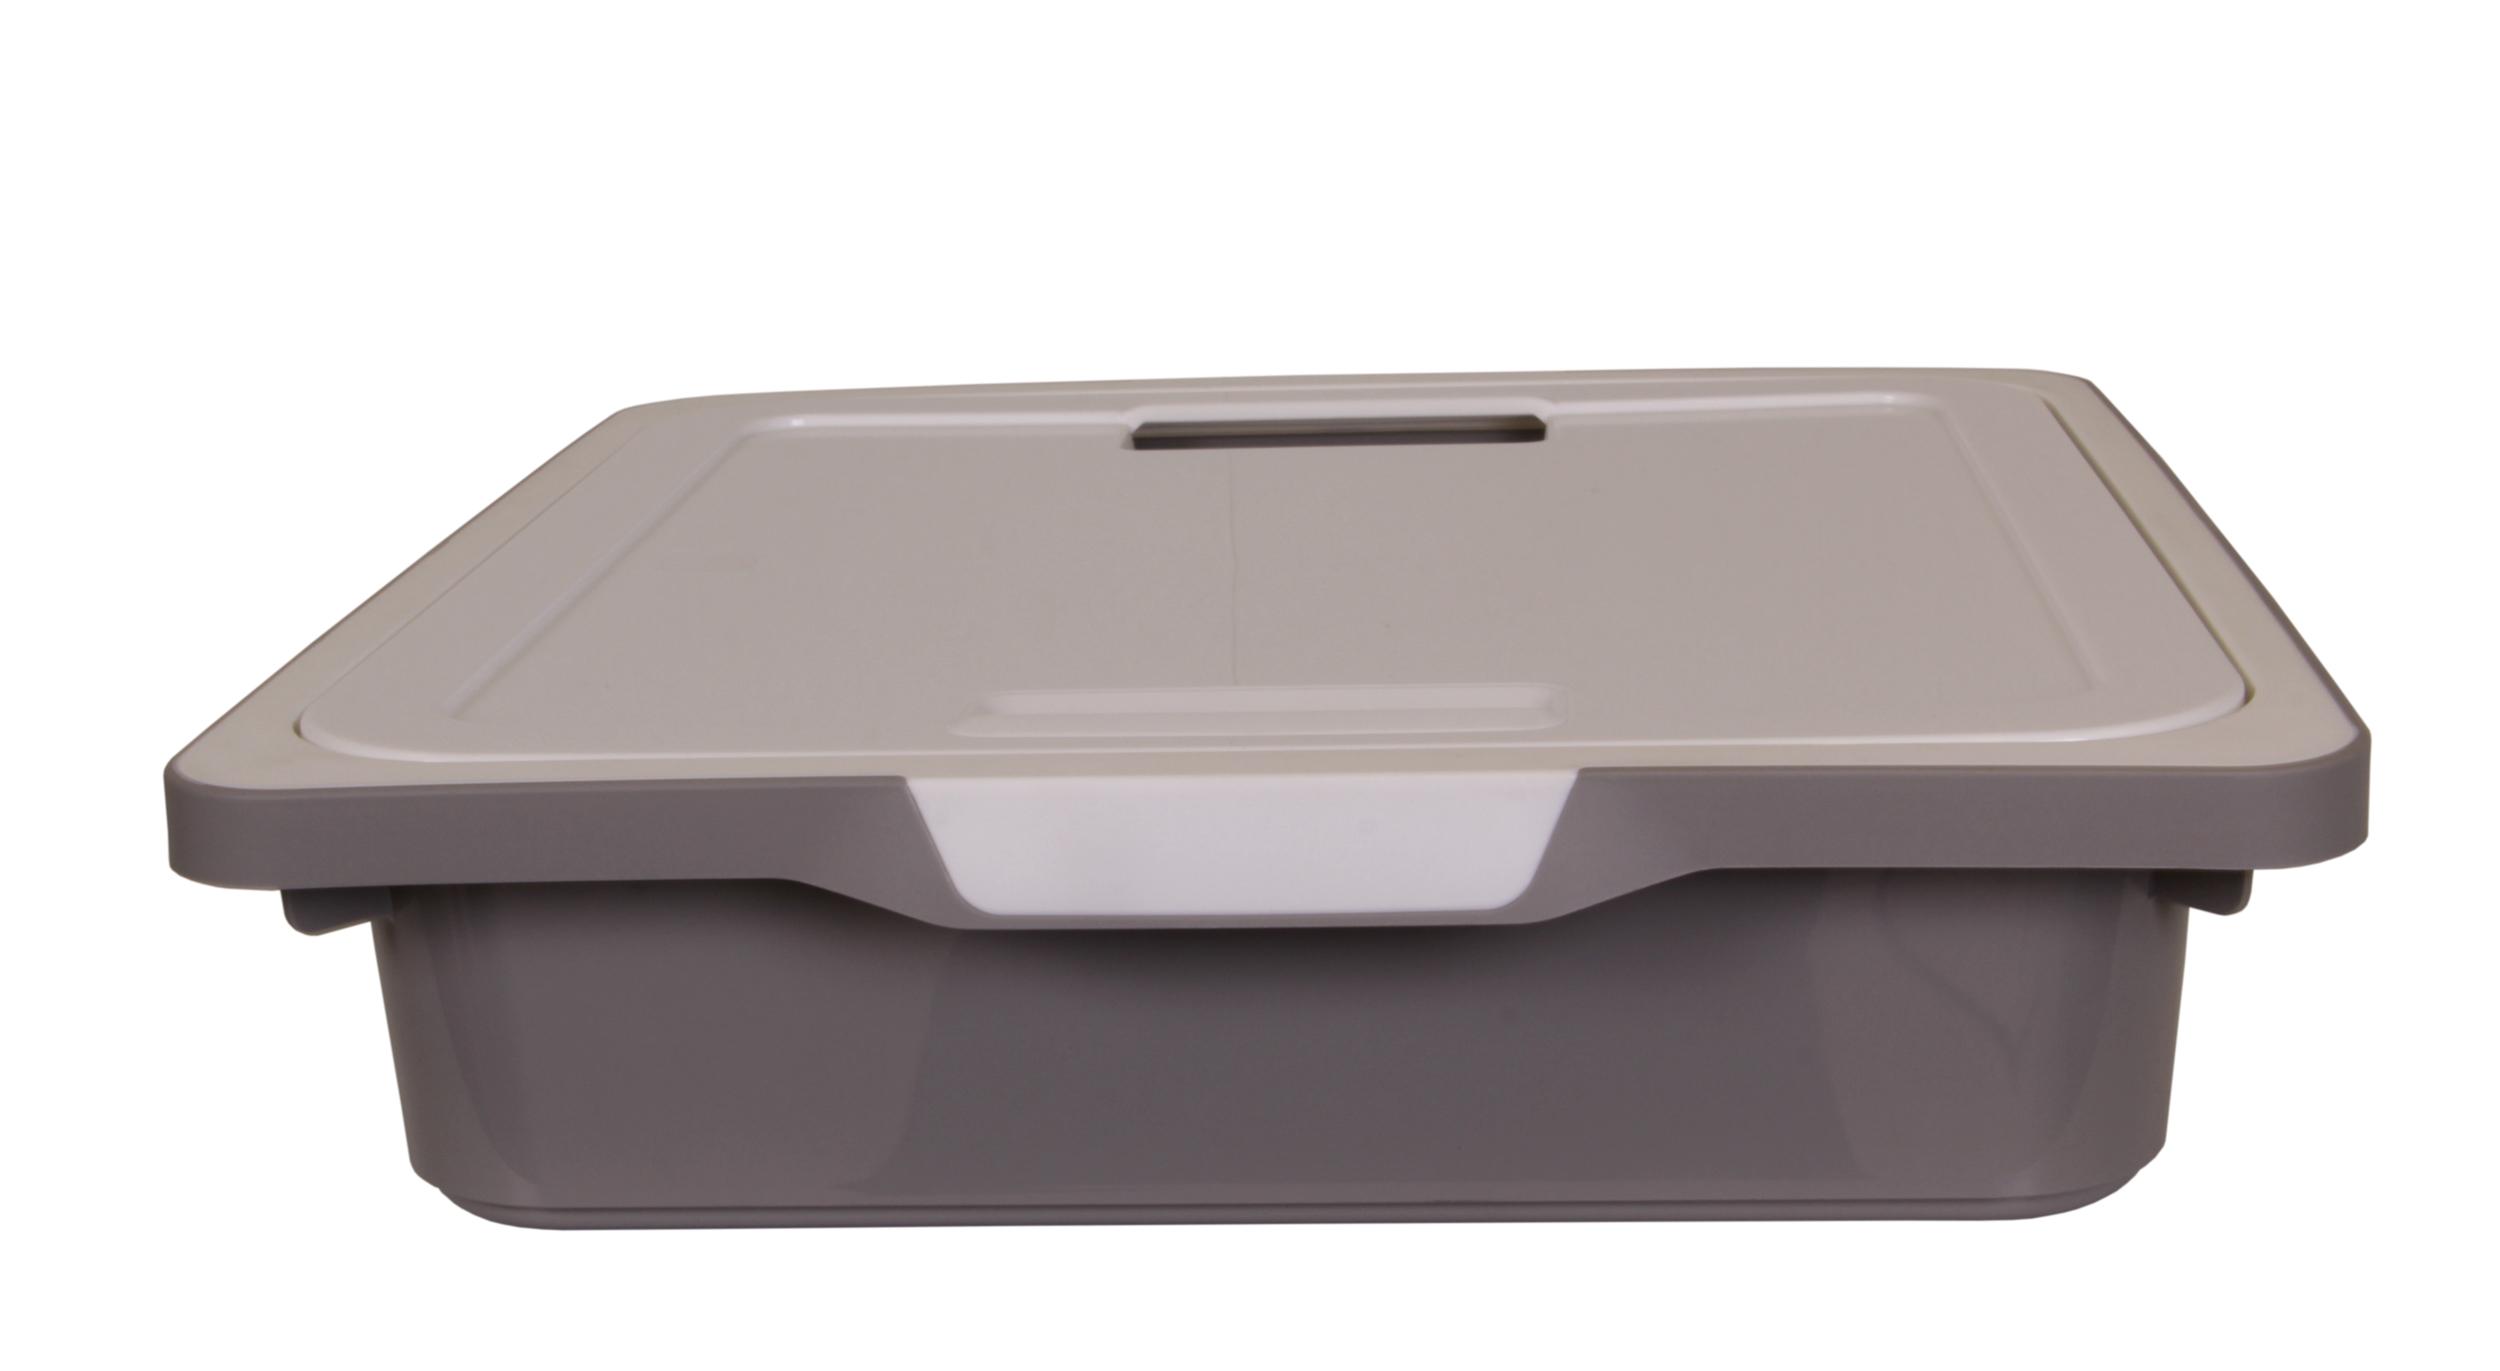 ondis24 kreo box mit deckel 7 5 liter grau wei g nstig. Black Bedroom Furniture Sets. Home Design Ideas